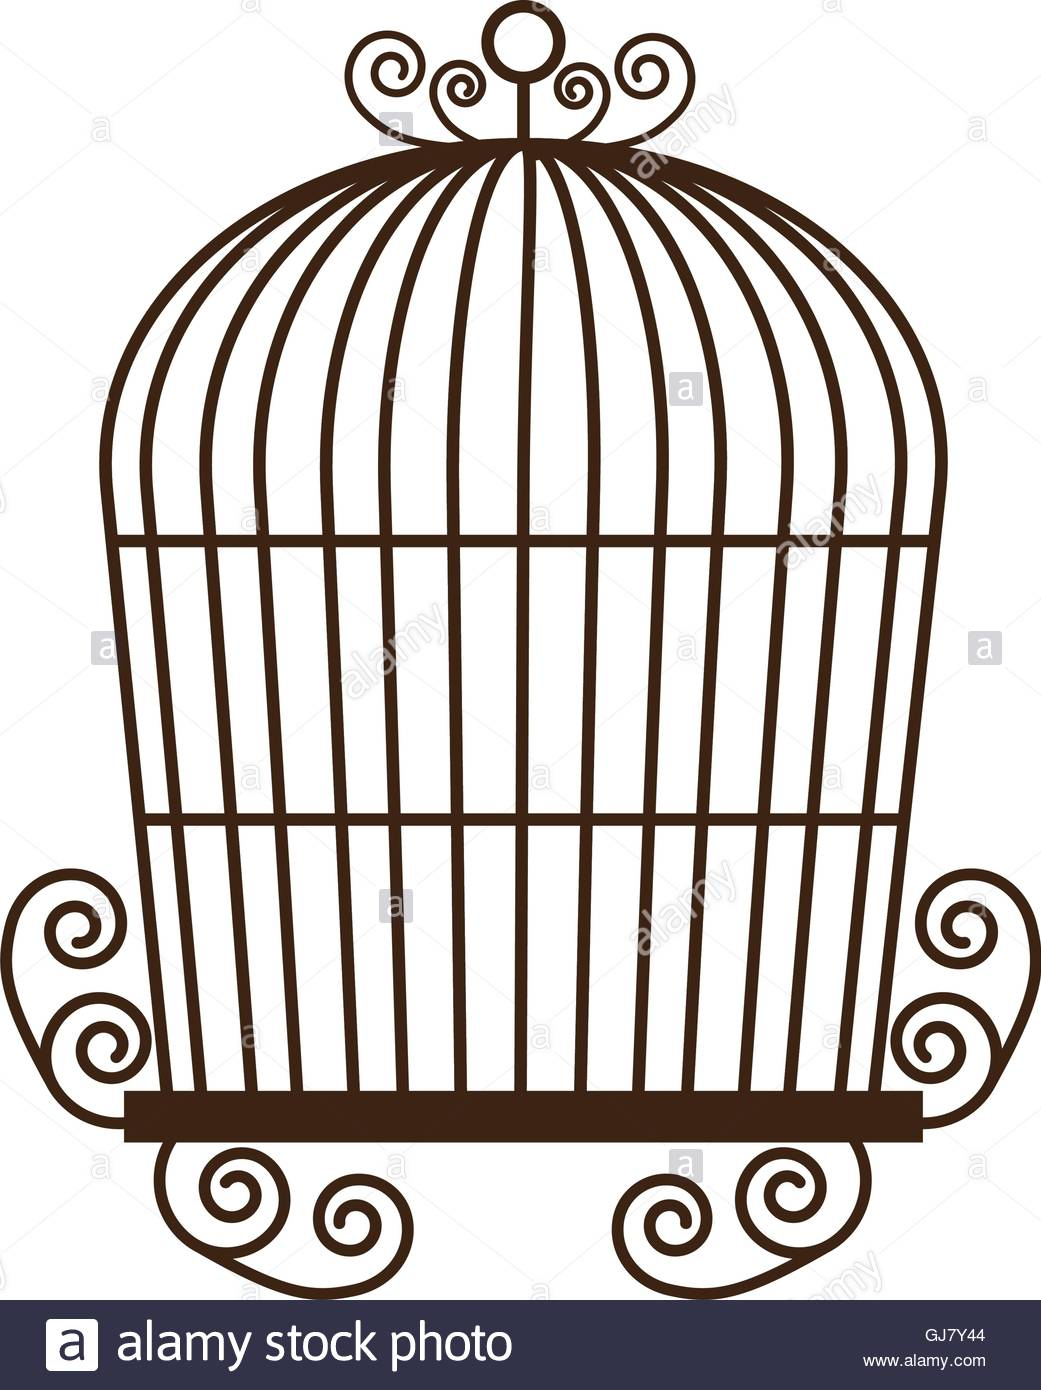 1041x1390 Birdcage Silhouette Vintage Icon Vector Stock Photos Amp Birdcage